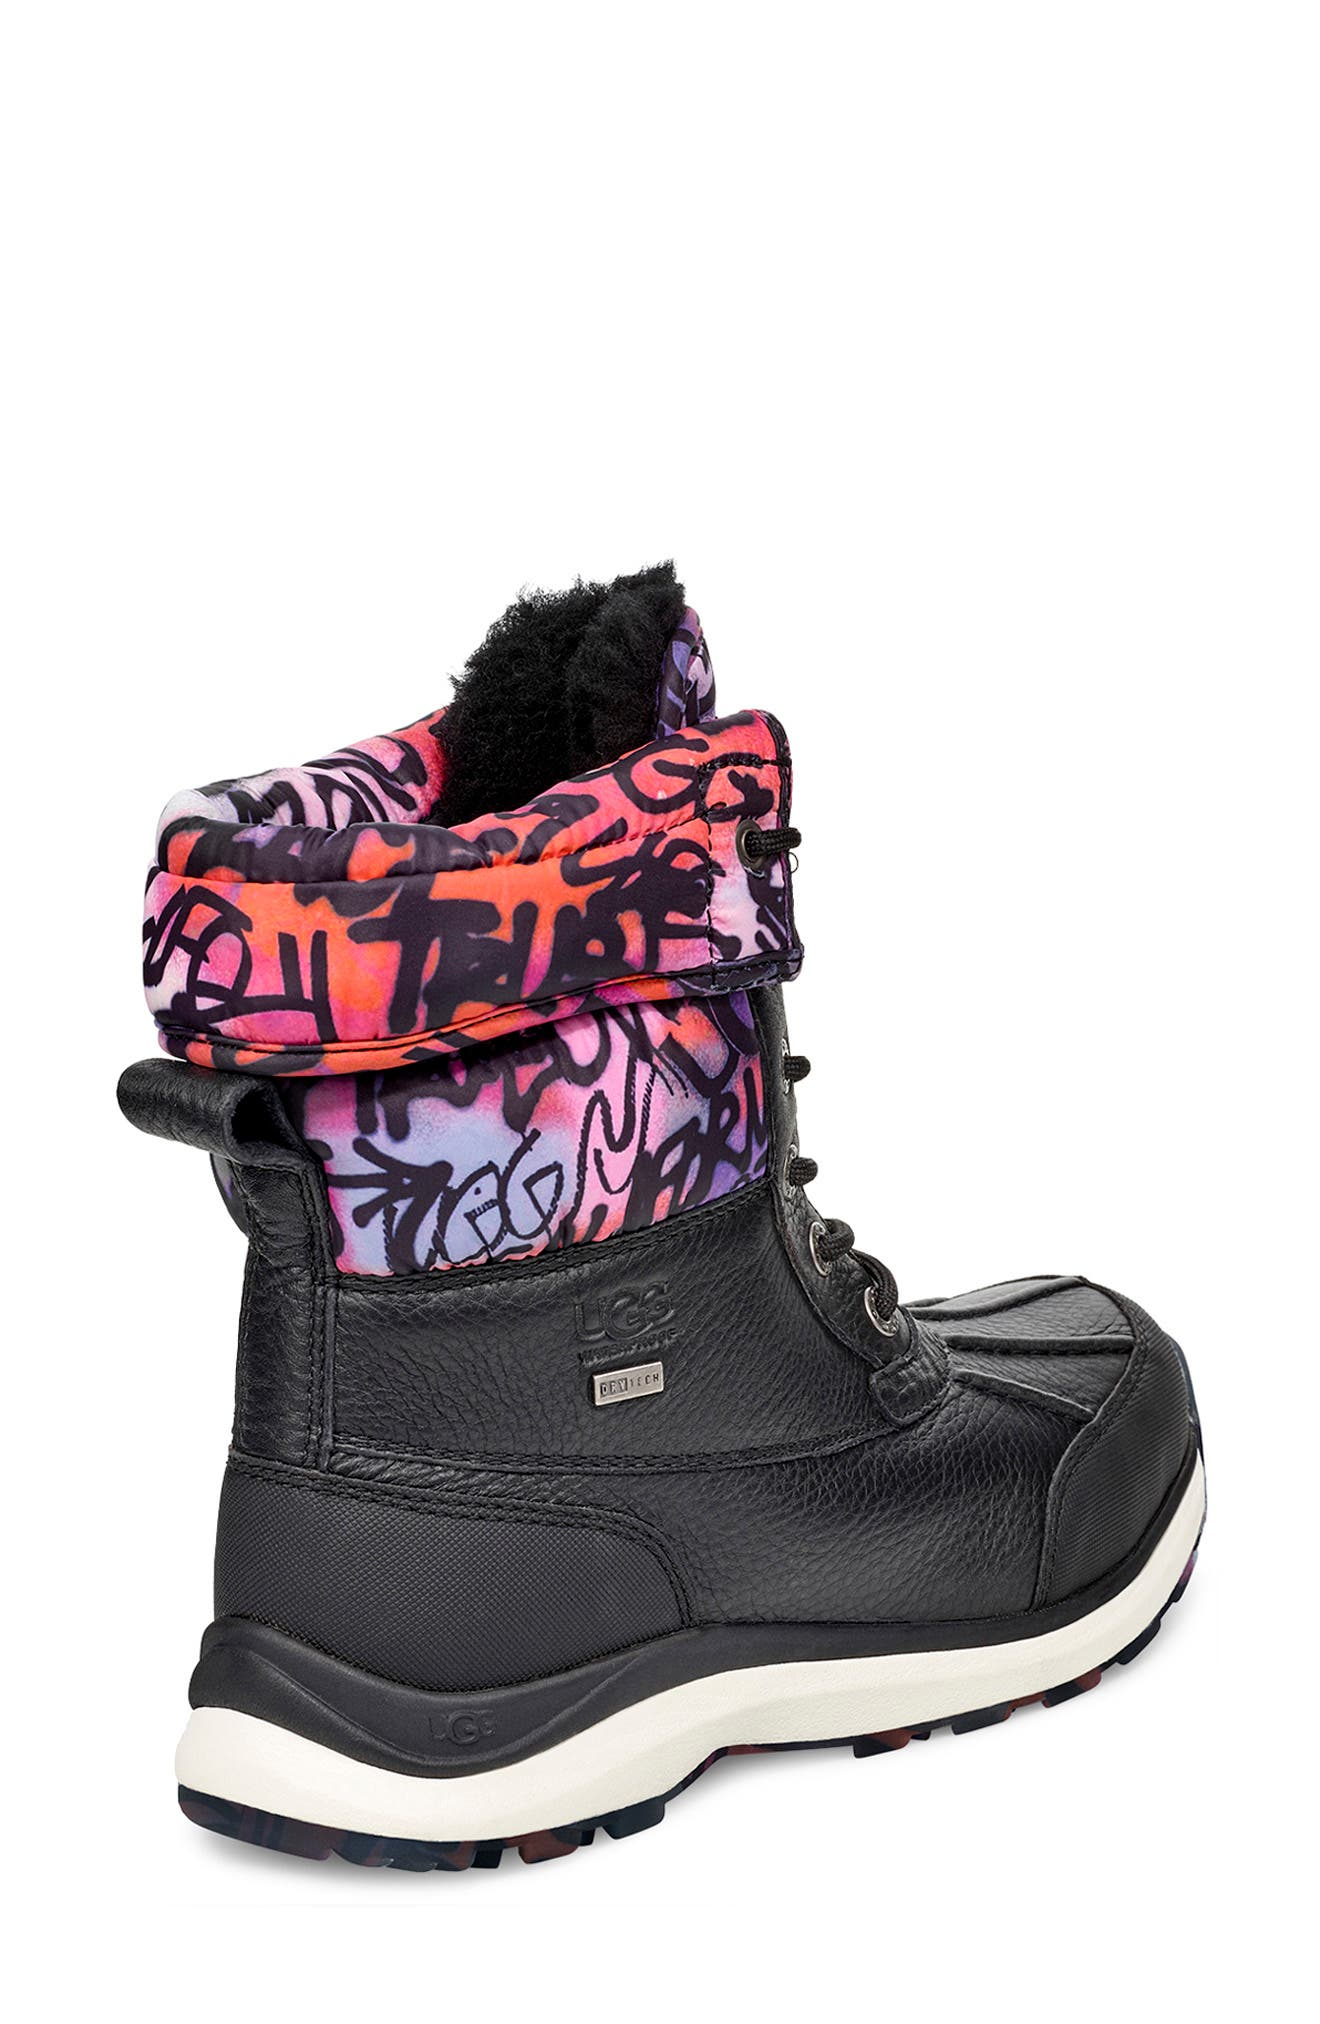 UGG Adirondack III Graffiti Waterproof Boot